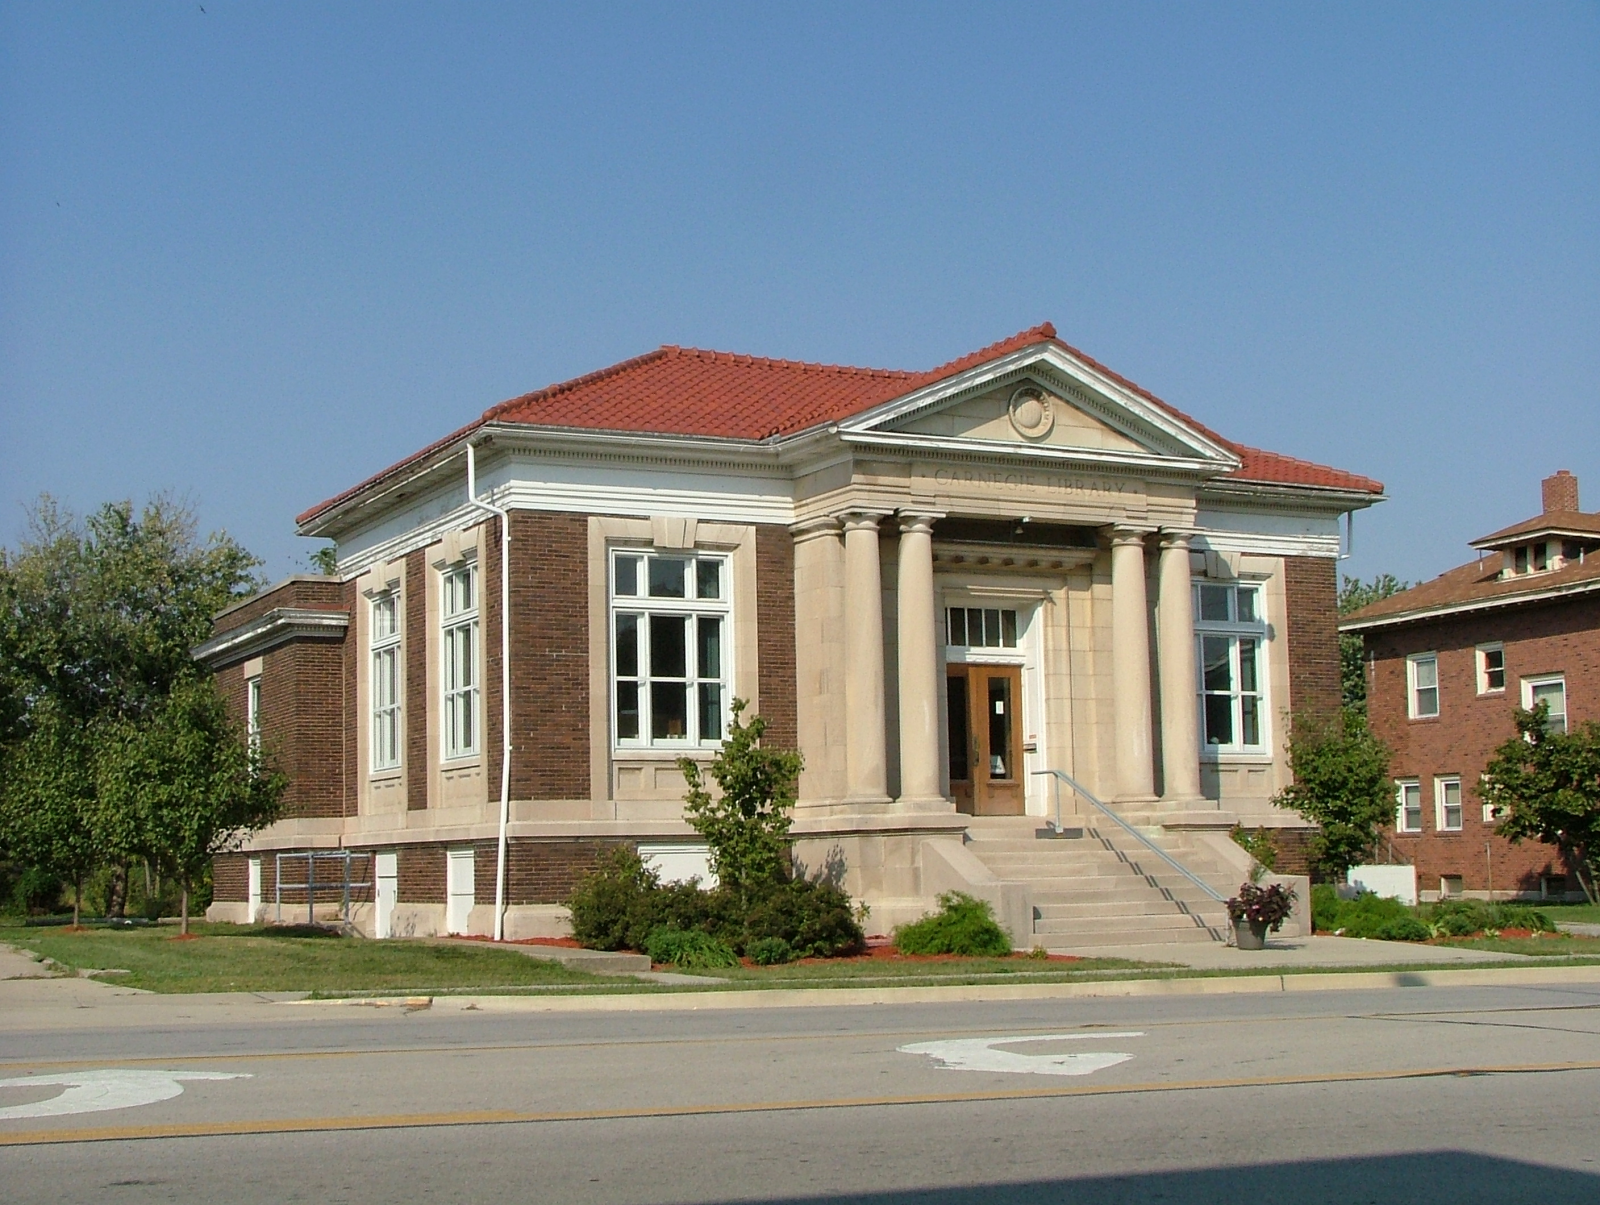 1910 Elwood Township Carnegie Public Library Ridge Farm Il Still In Use Carnegie Library House Styles Public Library